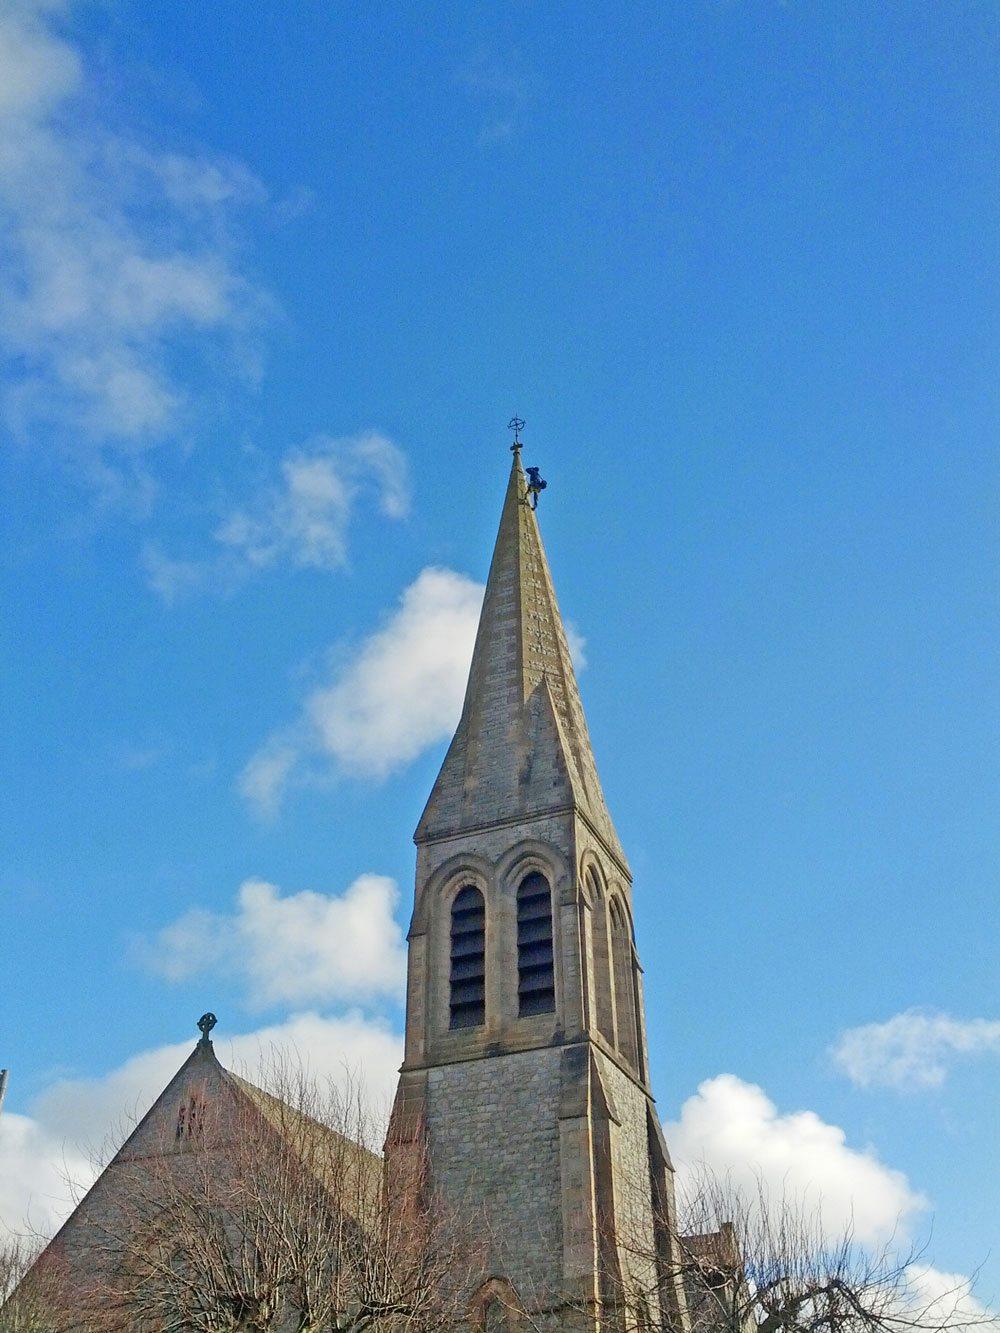 Church spire inspection